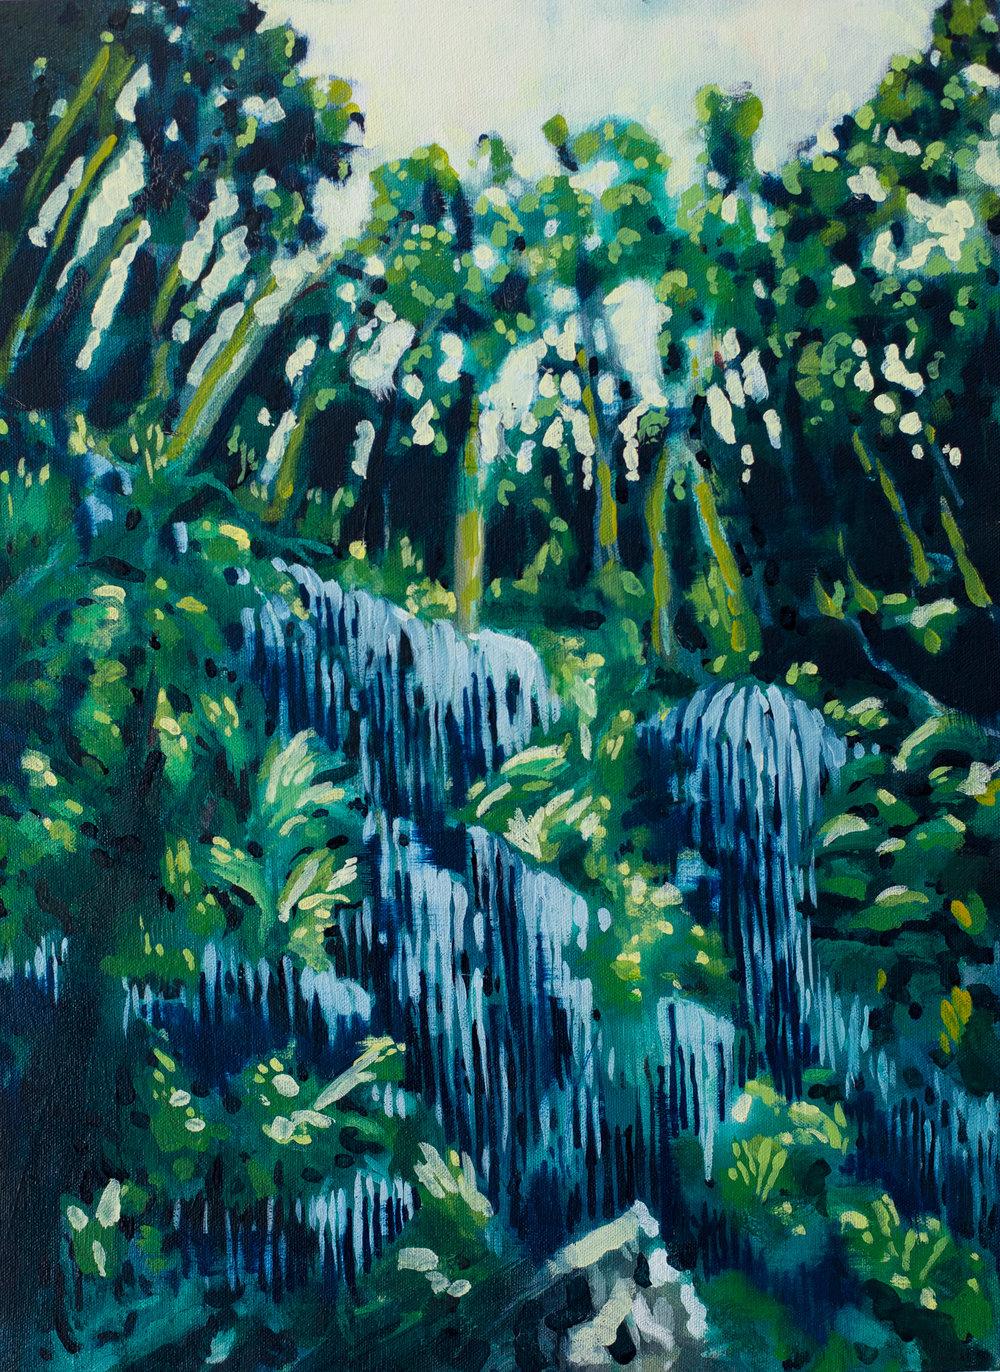 ' Buitengracht'   Leila Walter  Oil on canvas  400 x 540 x 40 mm  R 4340.00 excl. vat